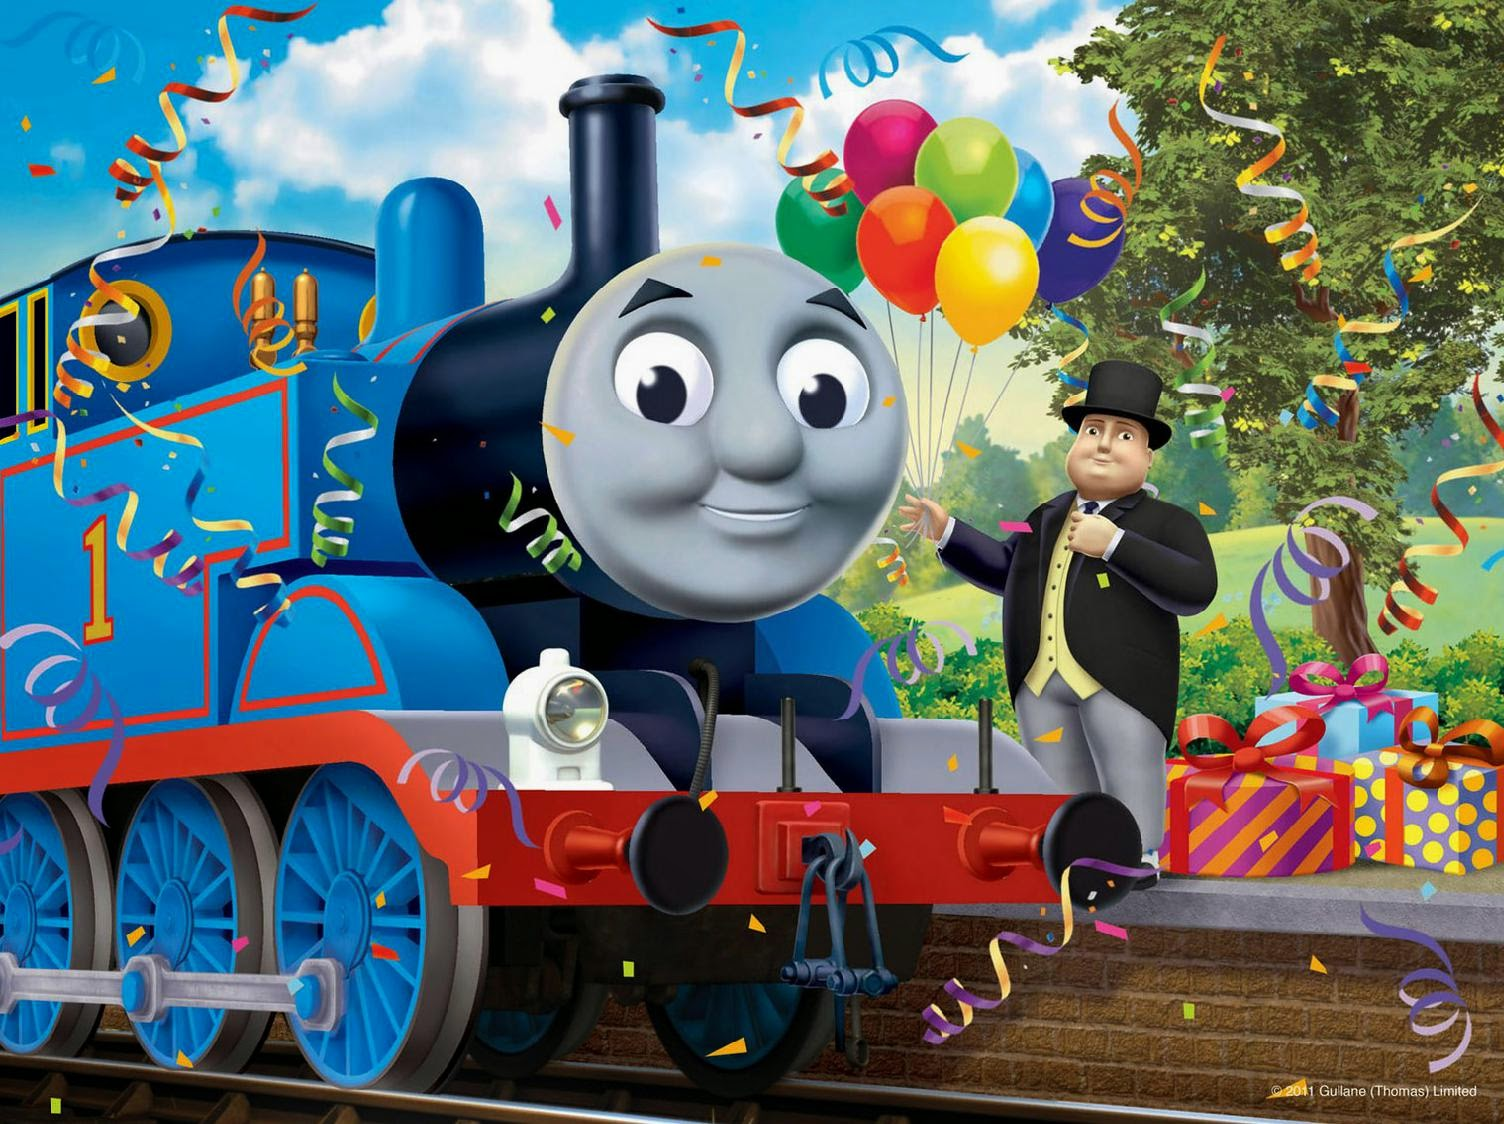 Gambar Thomas Friends Wallpaper Hd Tank Engine Gambar Lucu Terbaru Cartoon Animation Pictures